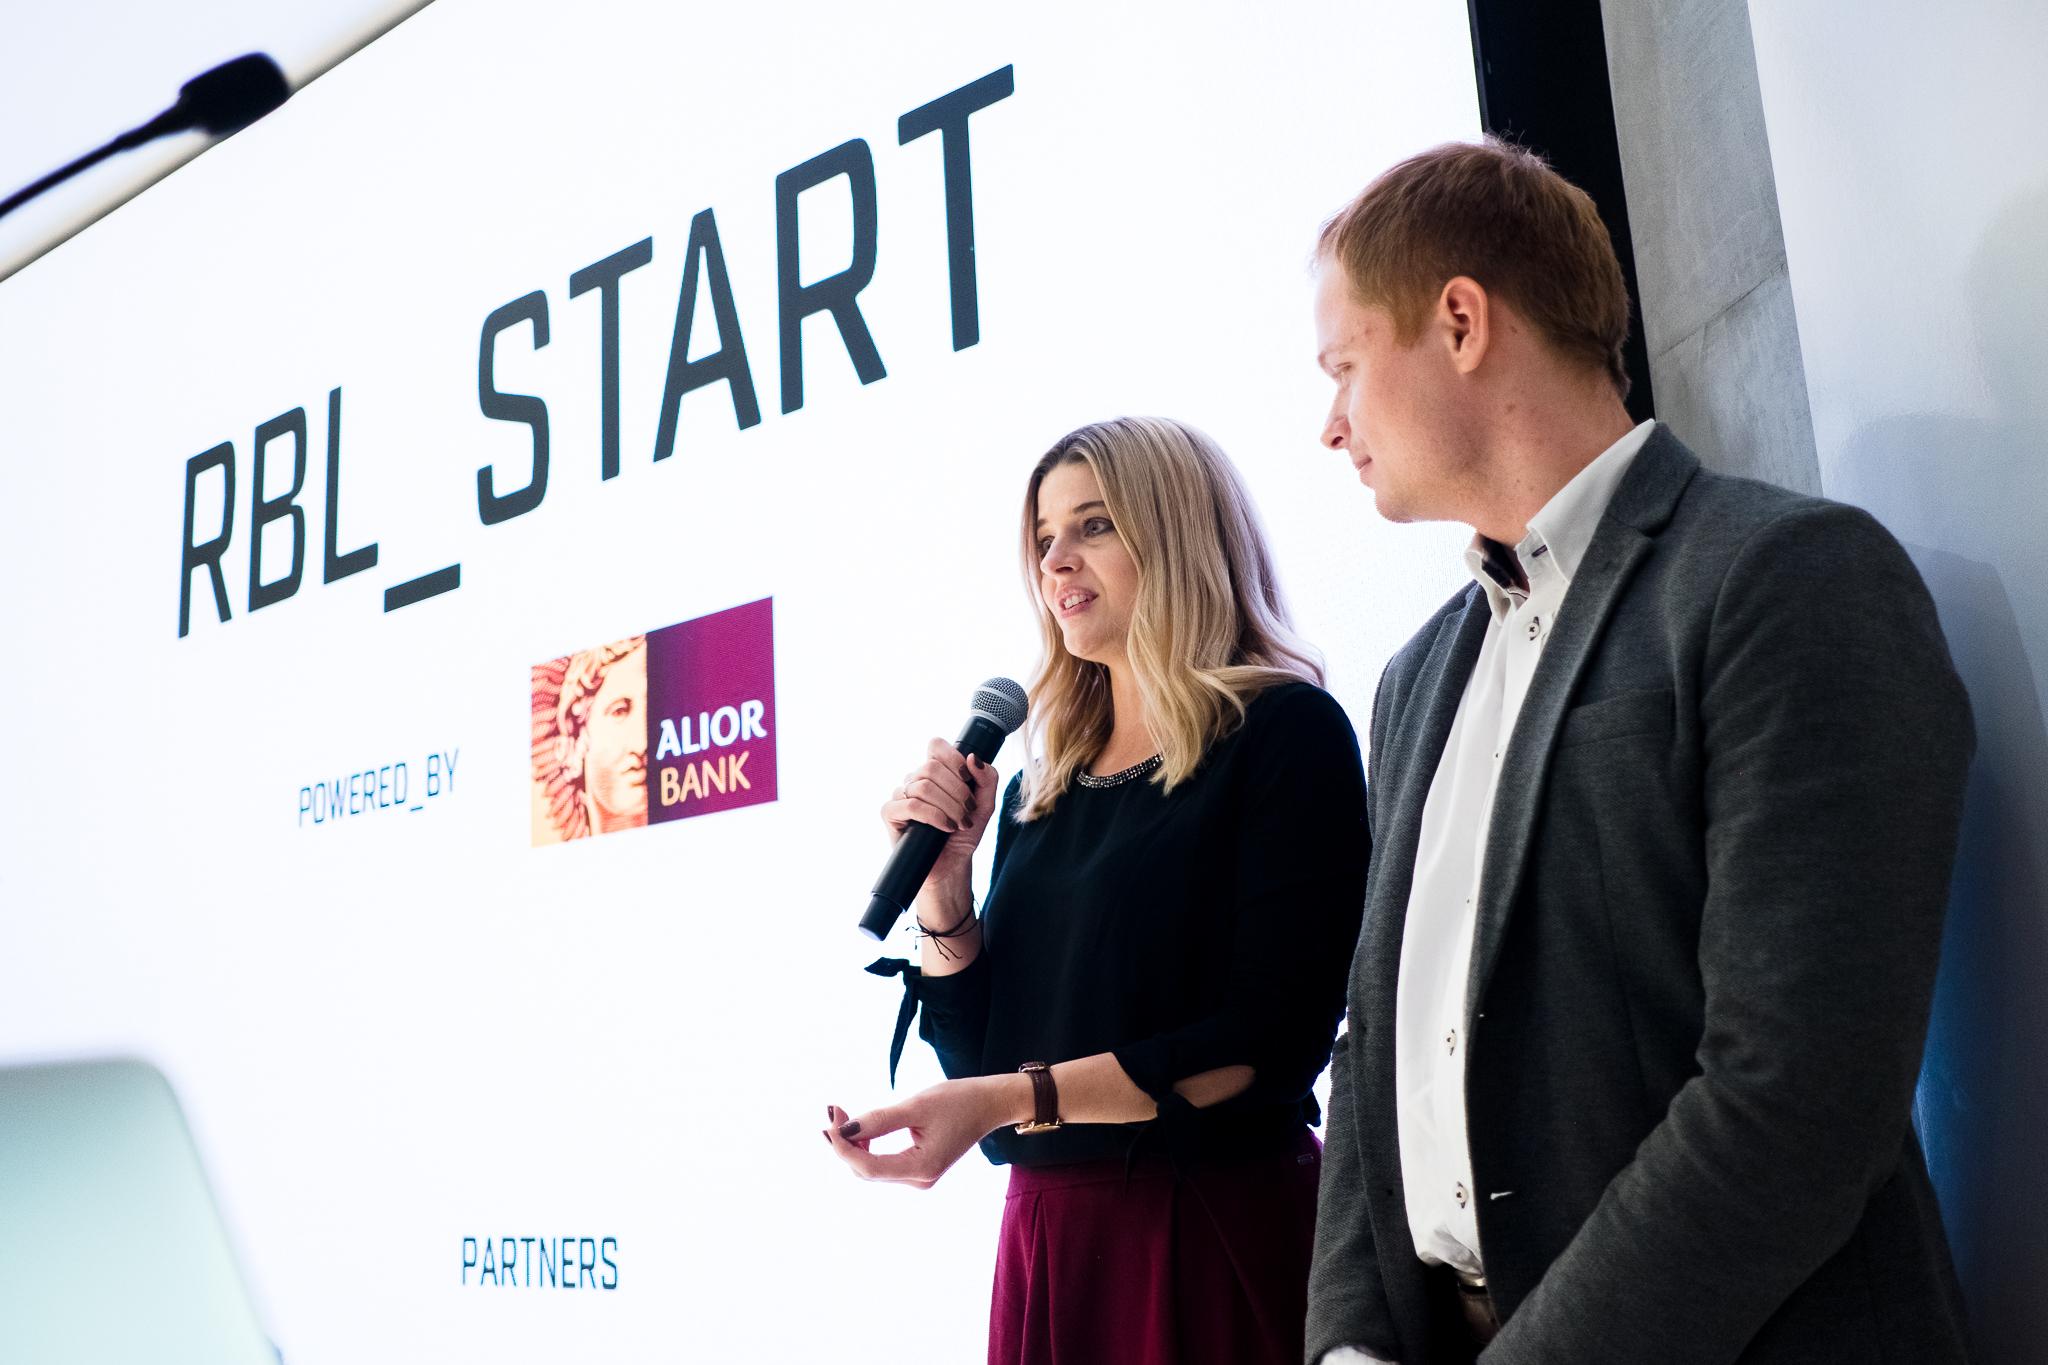 RBL_START mentorzy - Kamila Wincenciak, Konrad Radzik